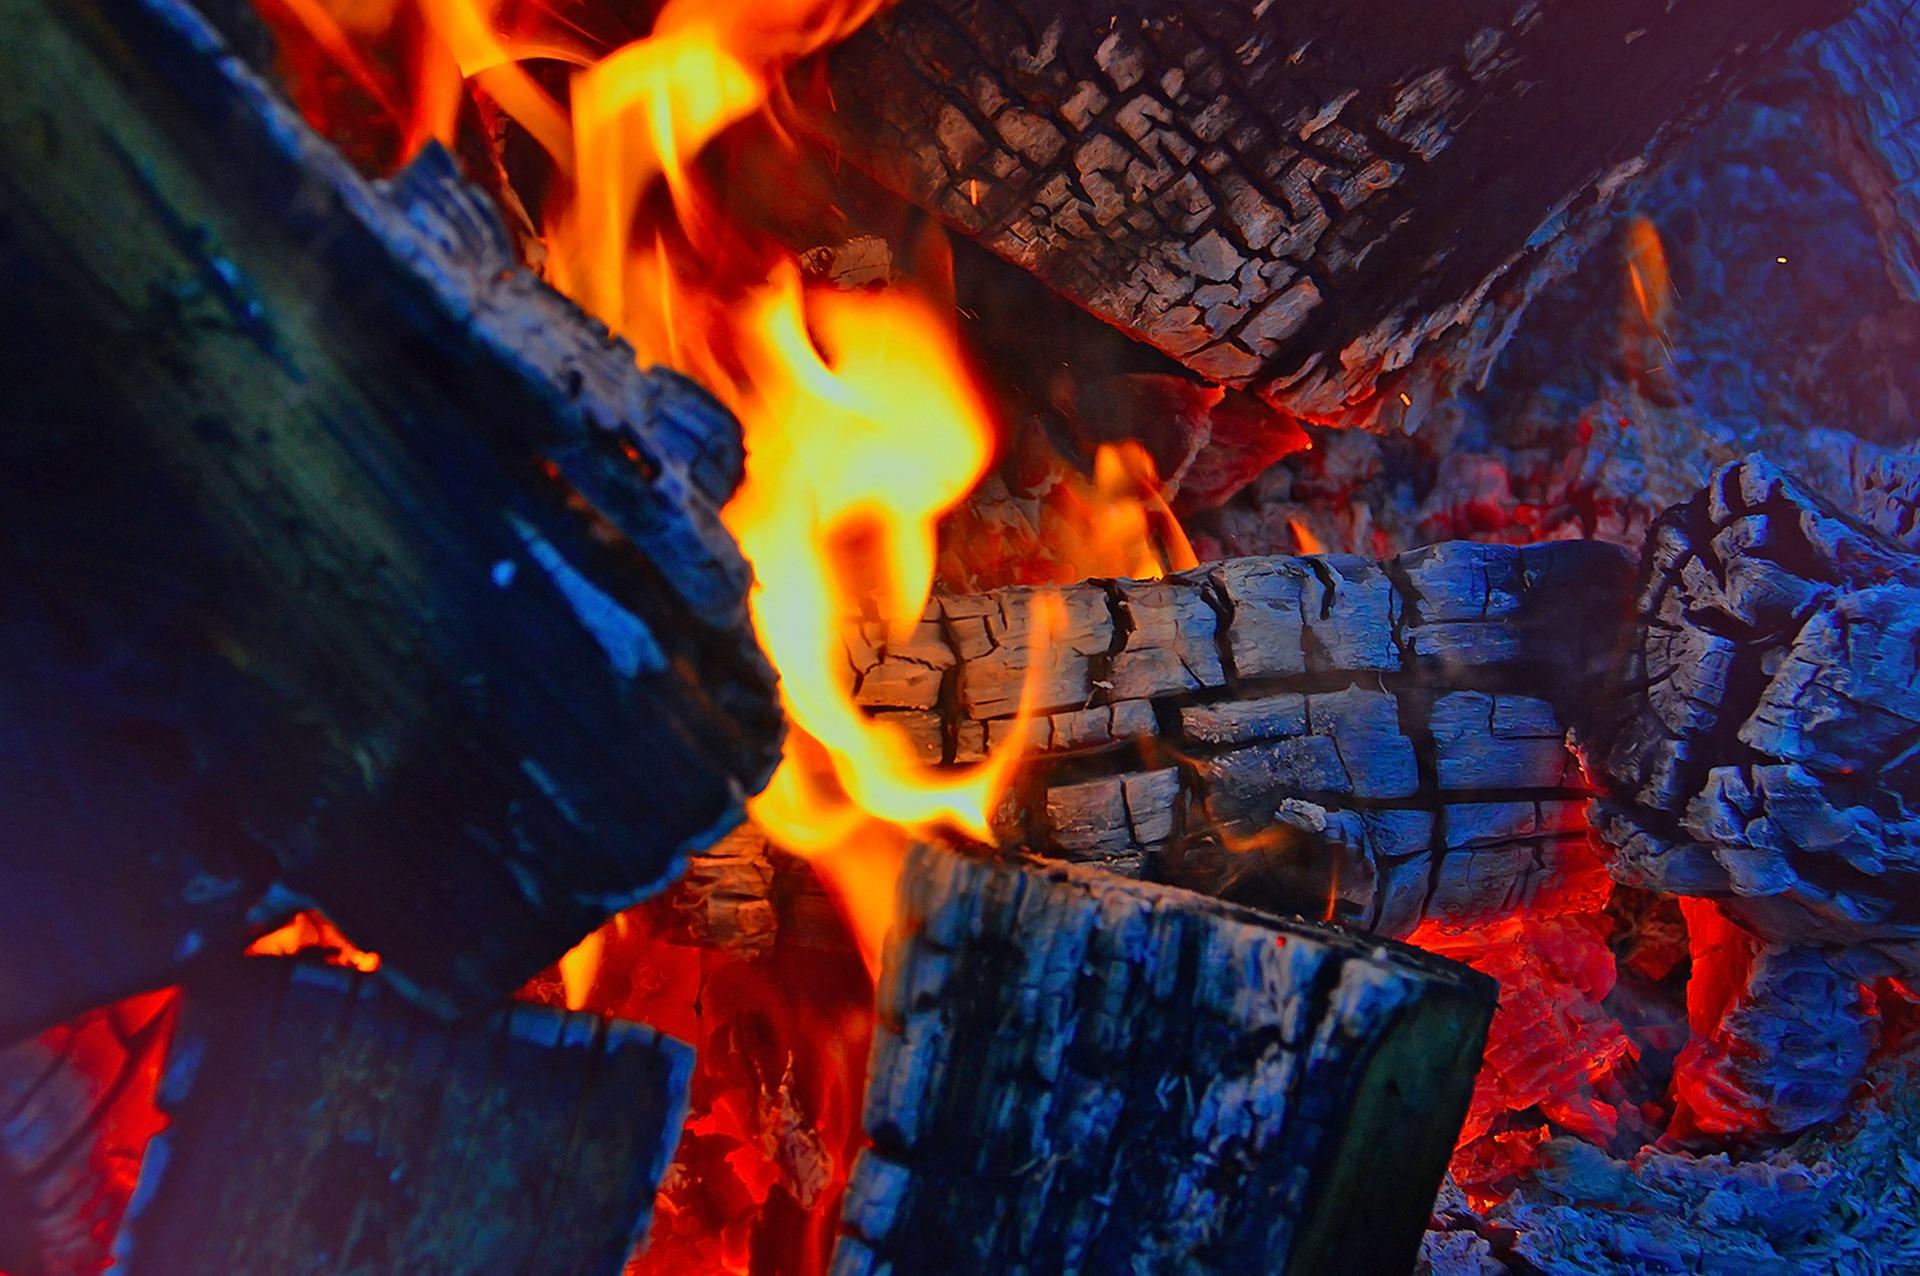 Paleo Feuer